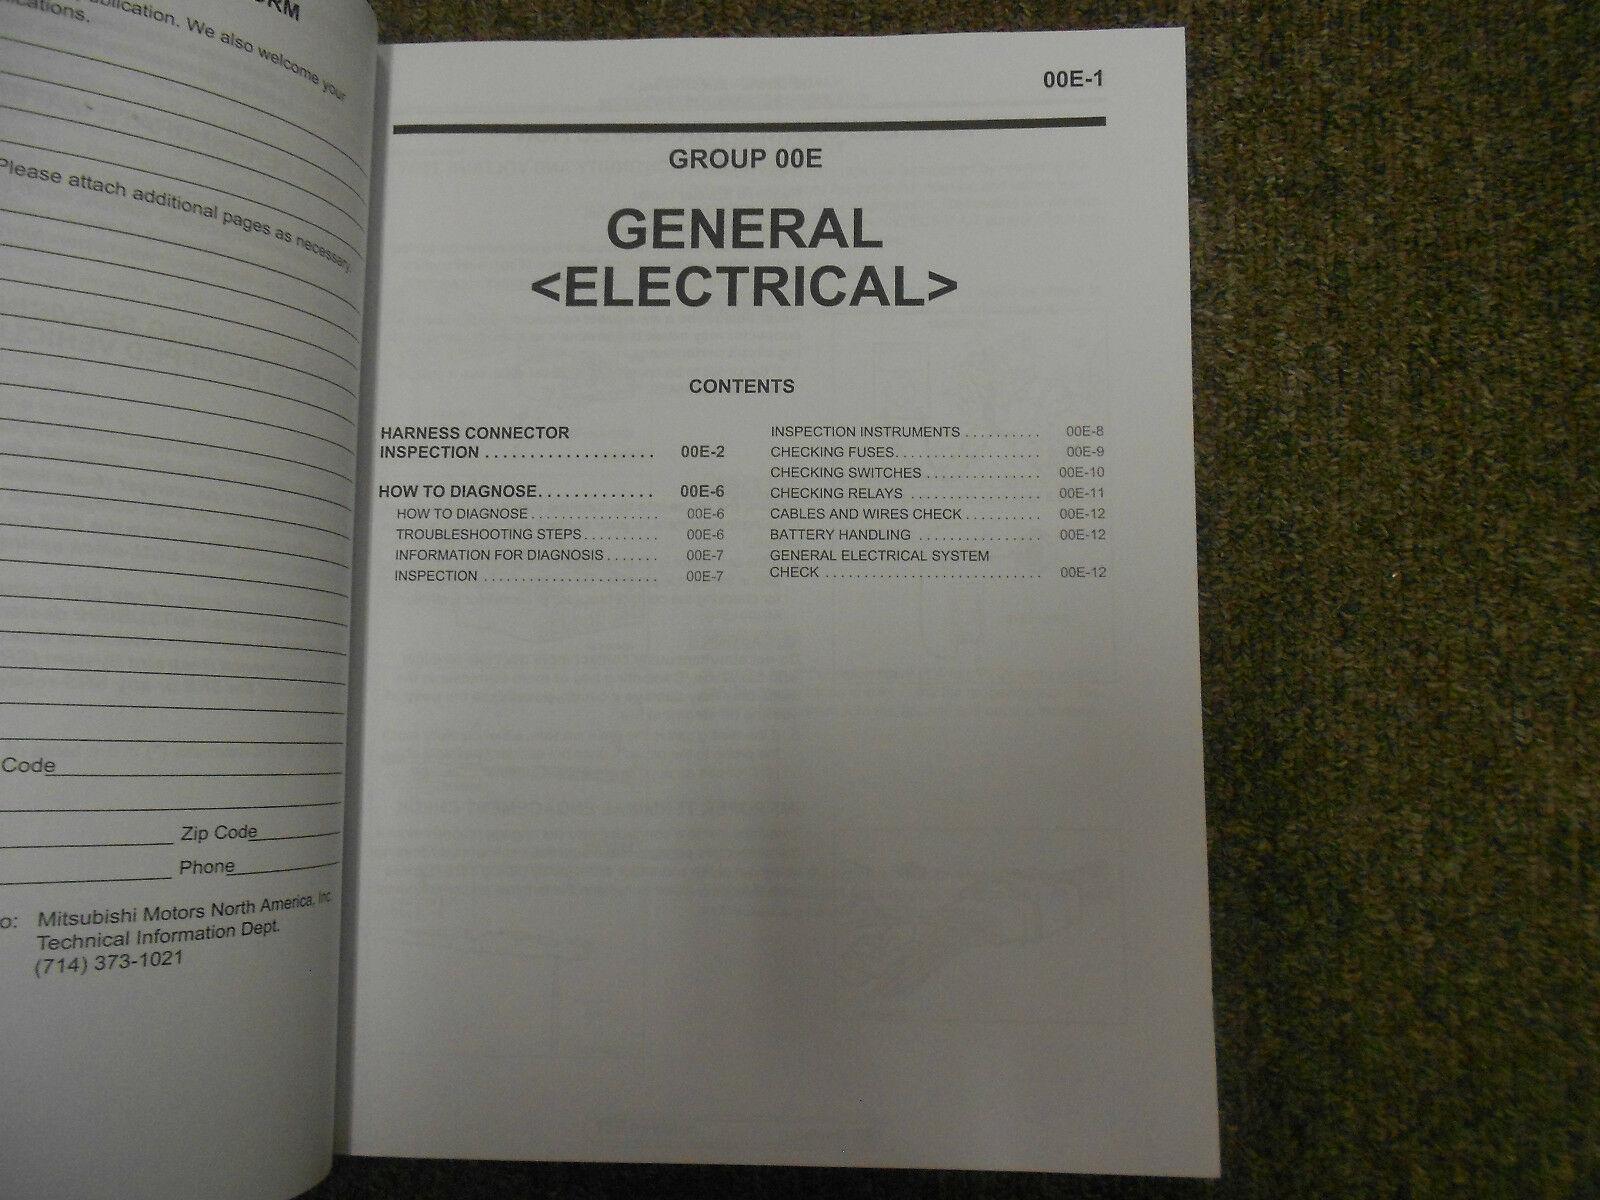 2010 MITSUBISHI Endeavor Electrical Supplement Service Repair Shop Manual FEO